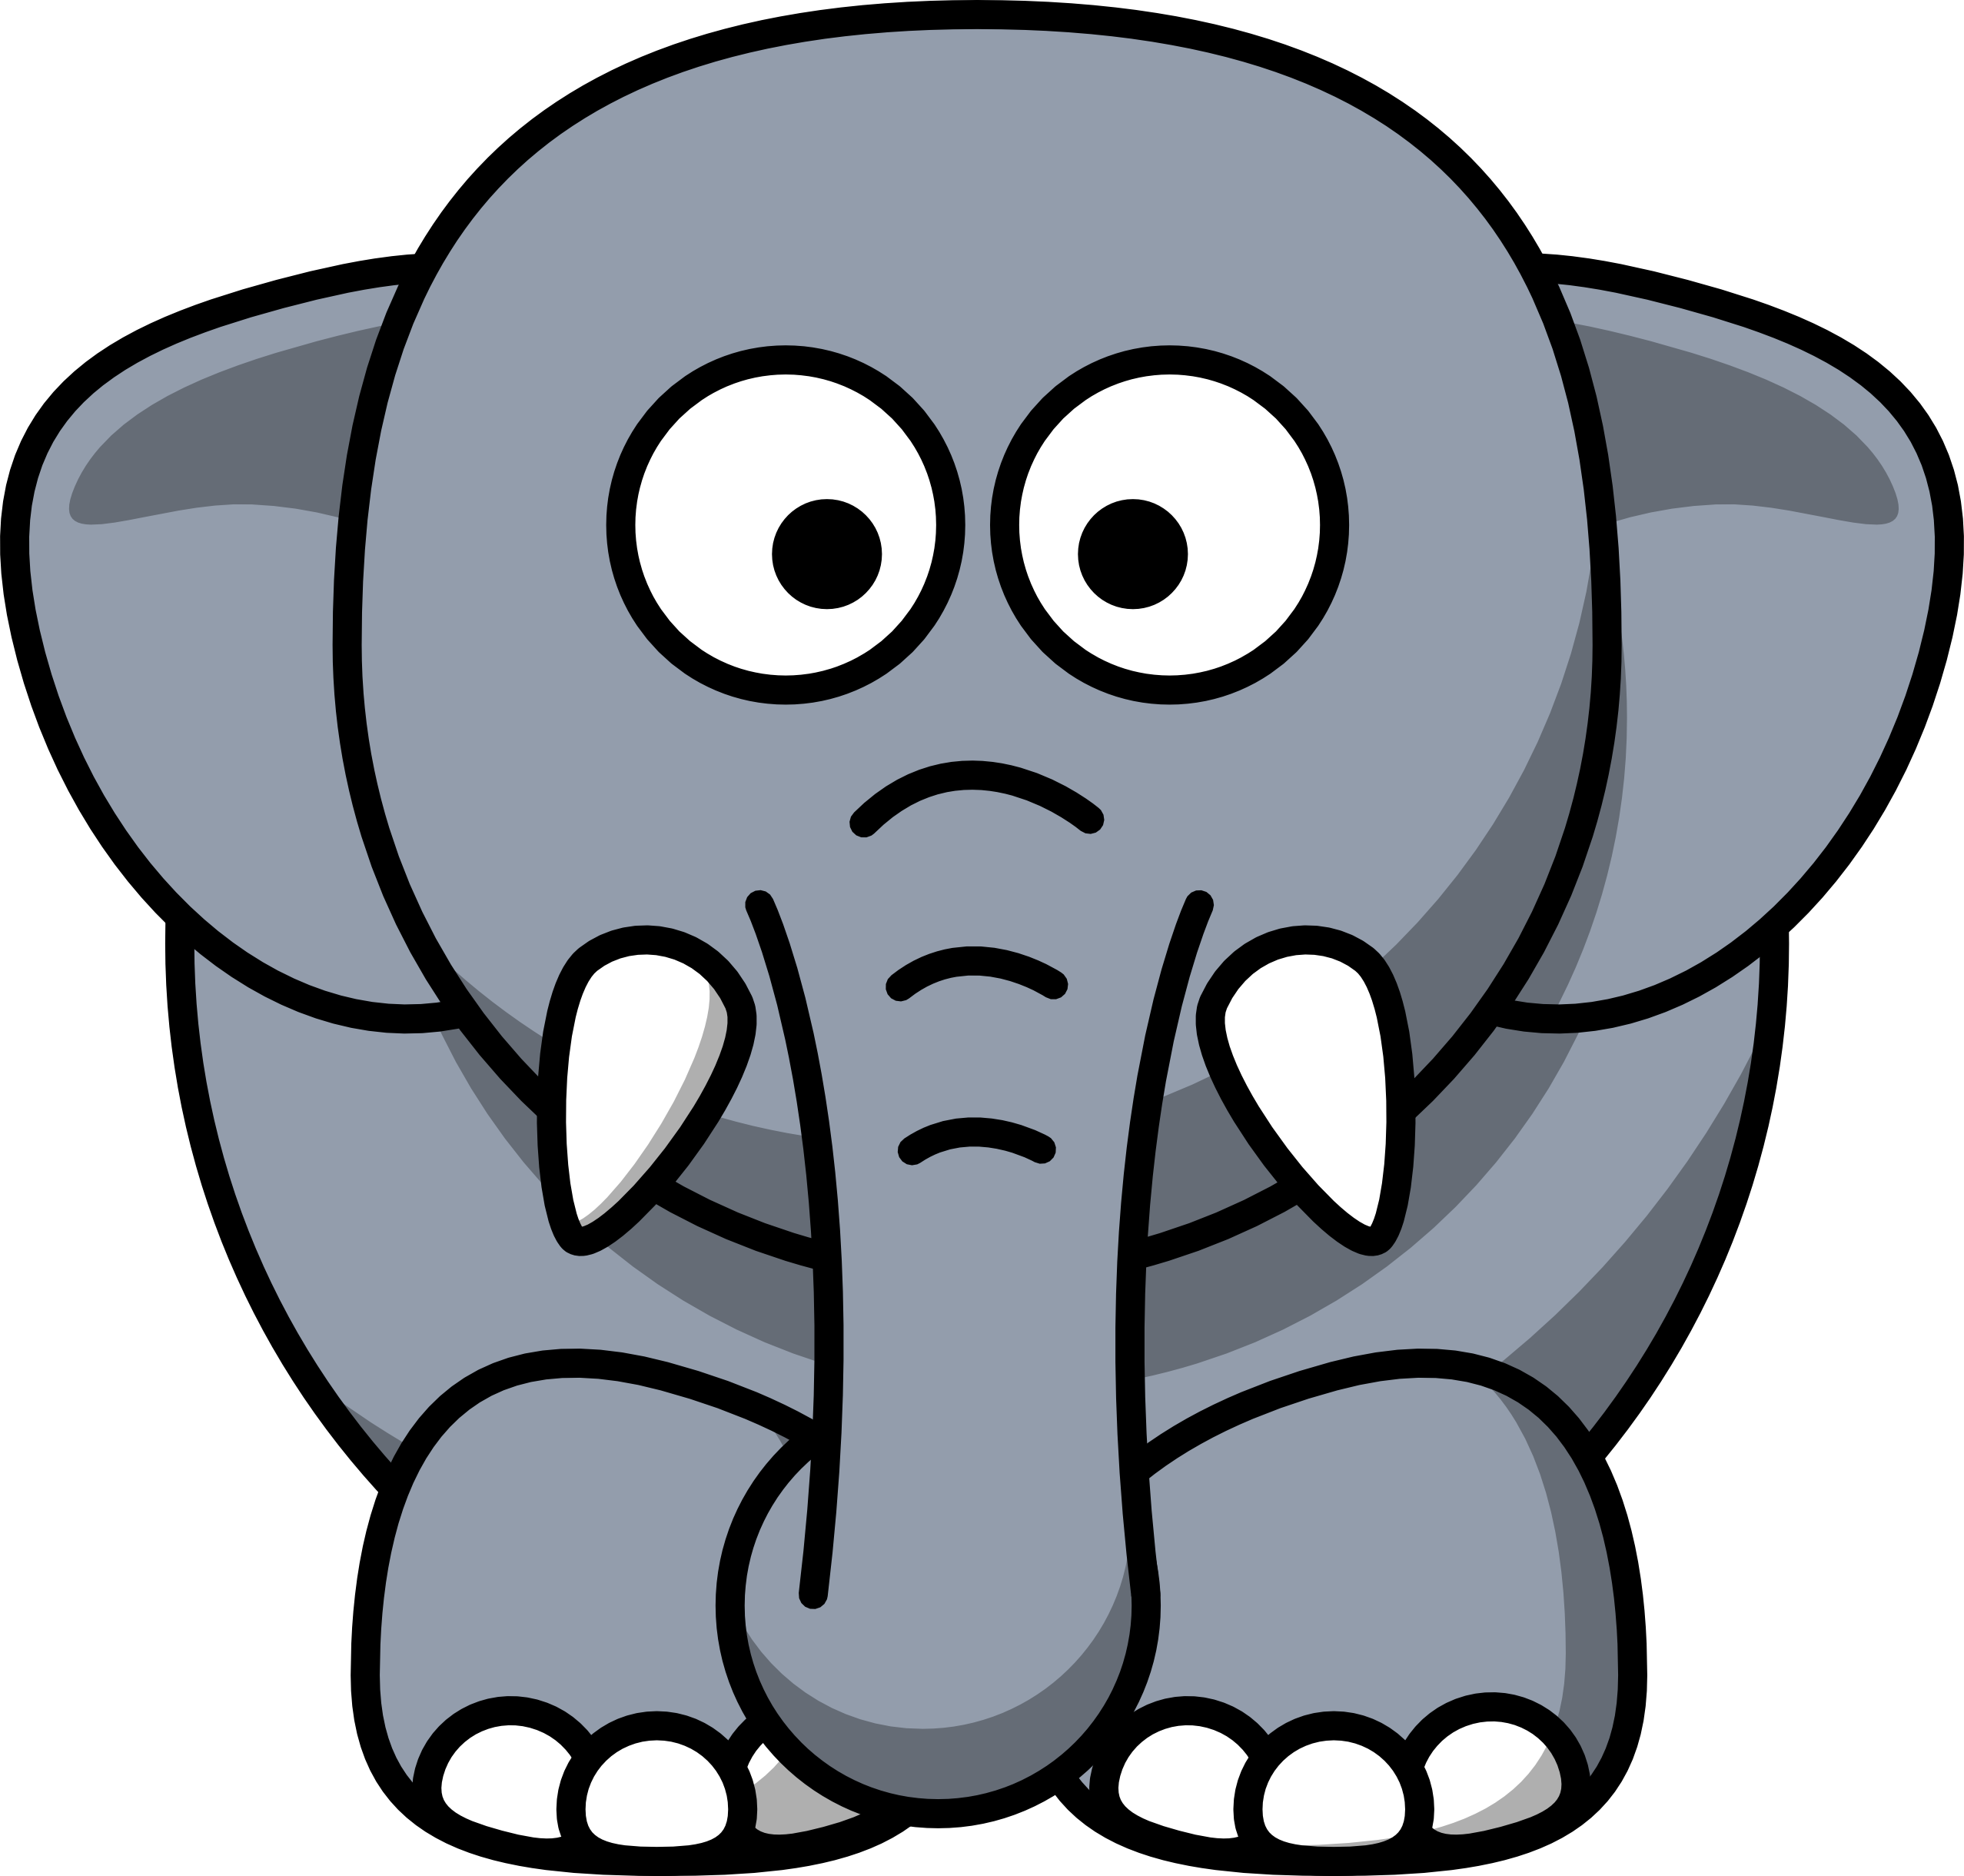 Cartoon Elephant Images - Cliparts.co